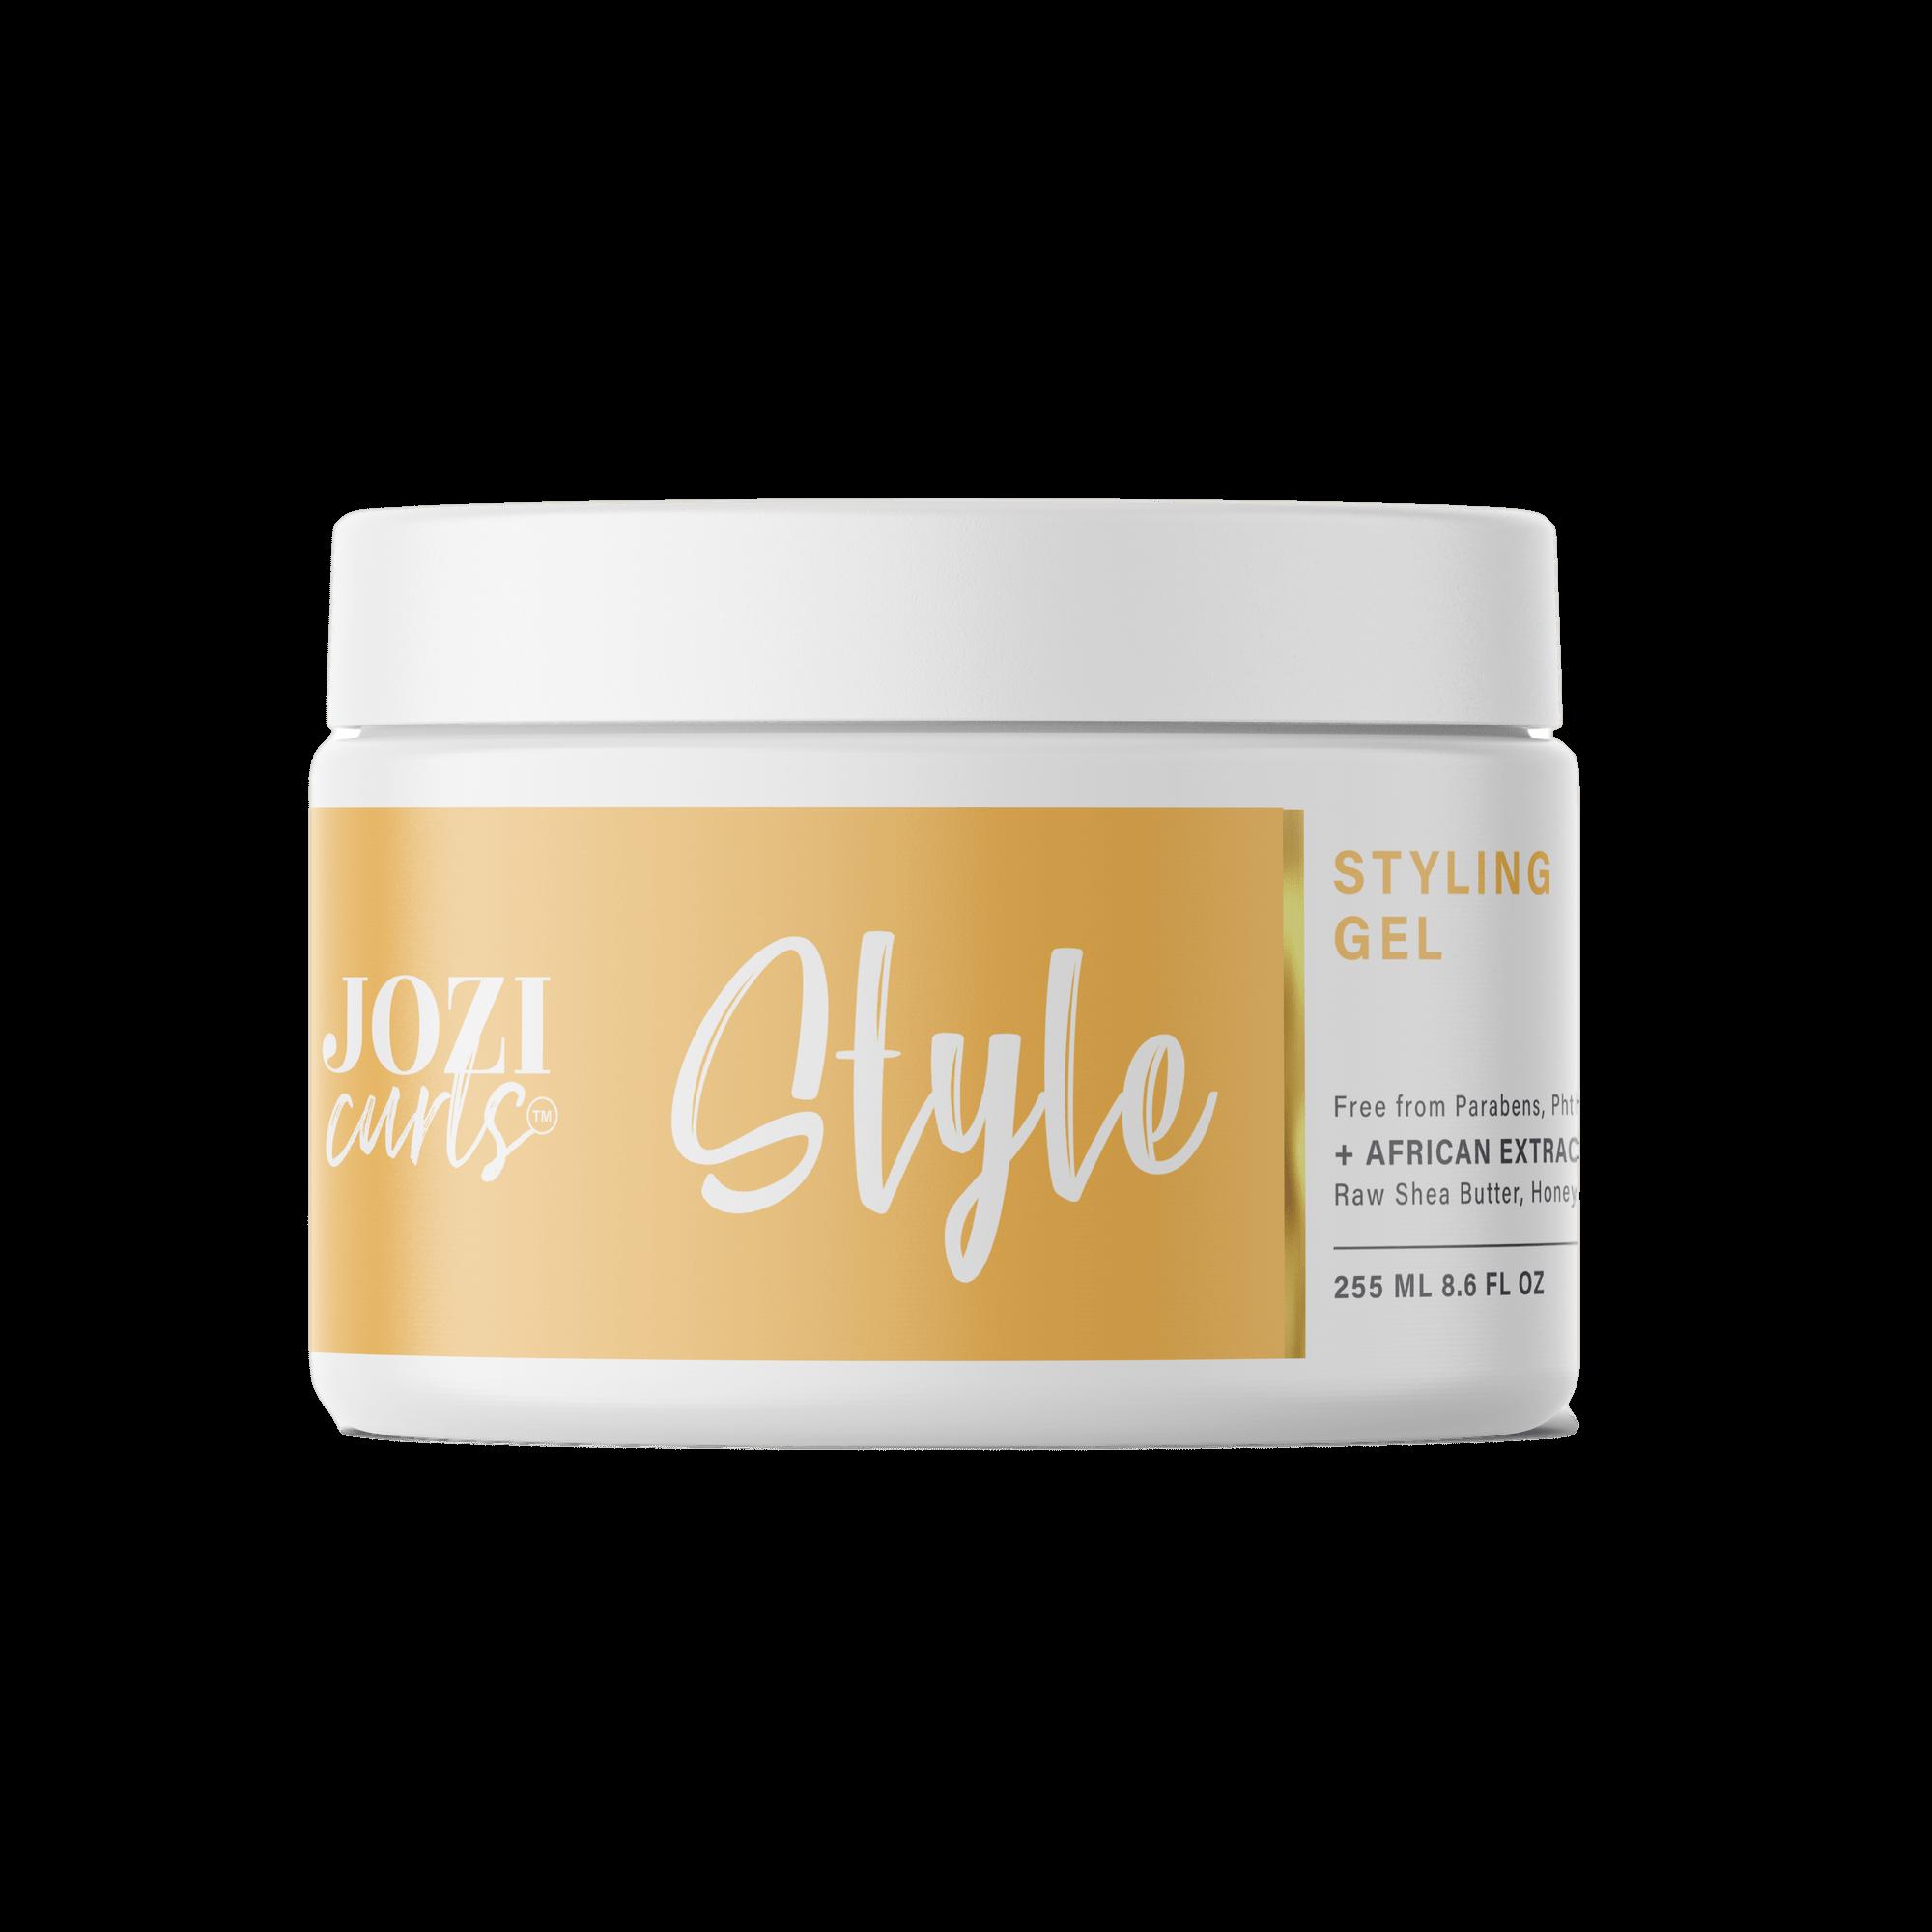 Productos pelo rizo, Jozi Curls